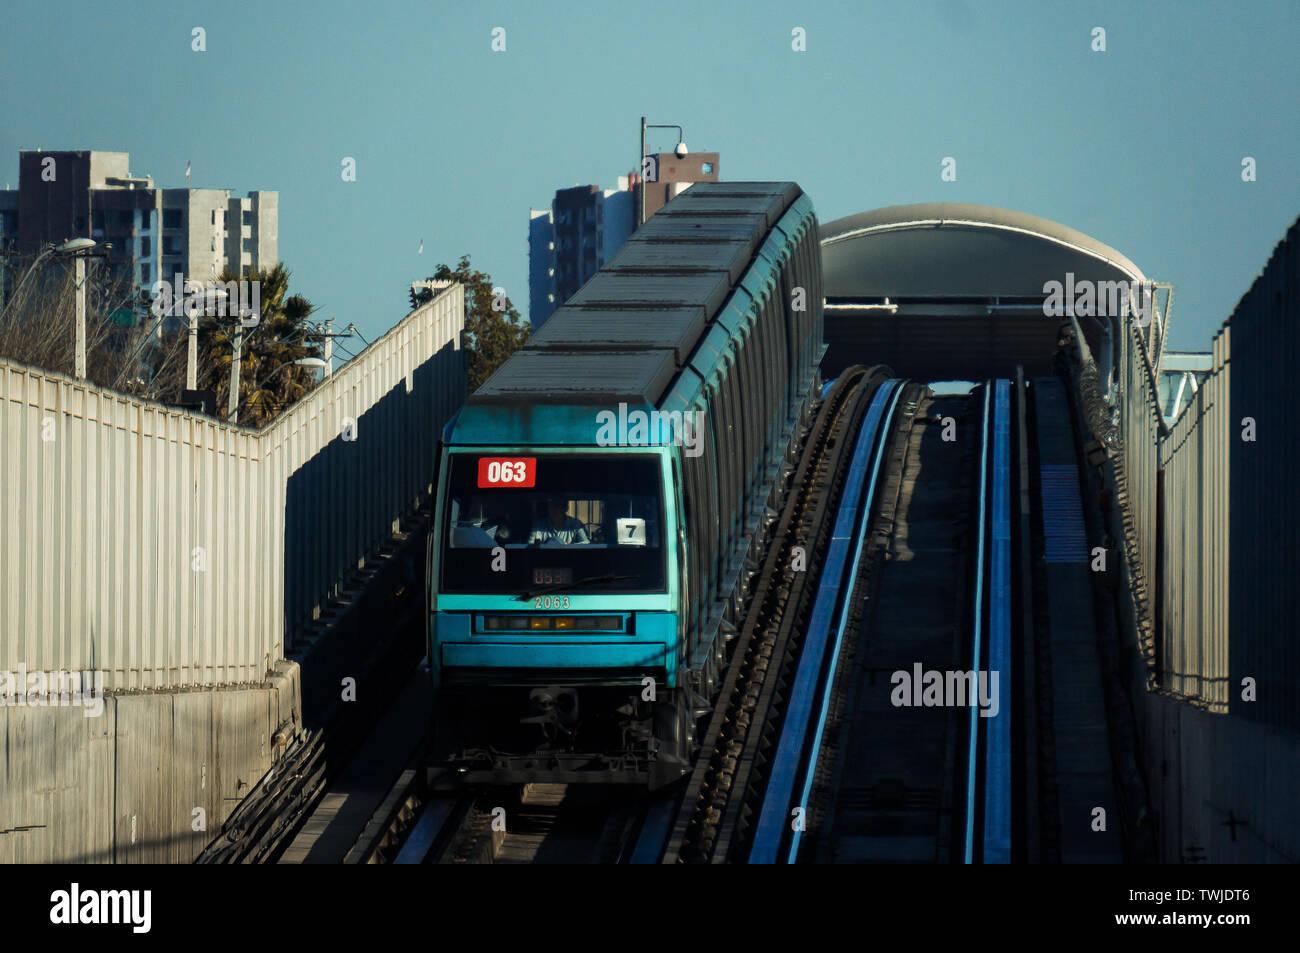 SANTIAGO, CHILE - AUGUST 2016: Metro de Santiago train entering the